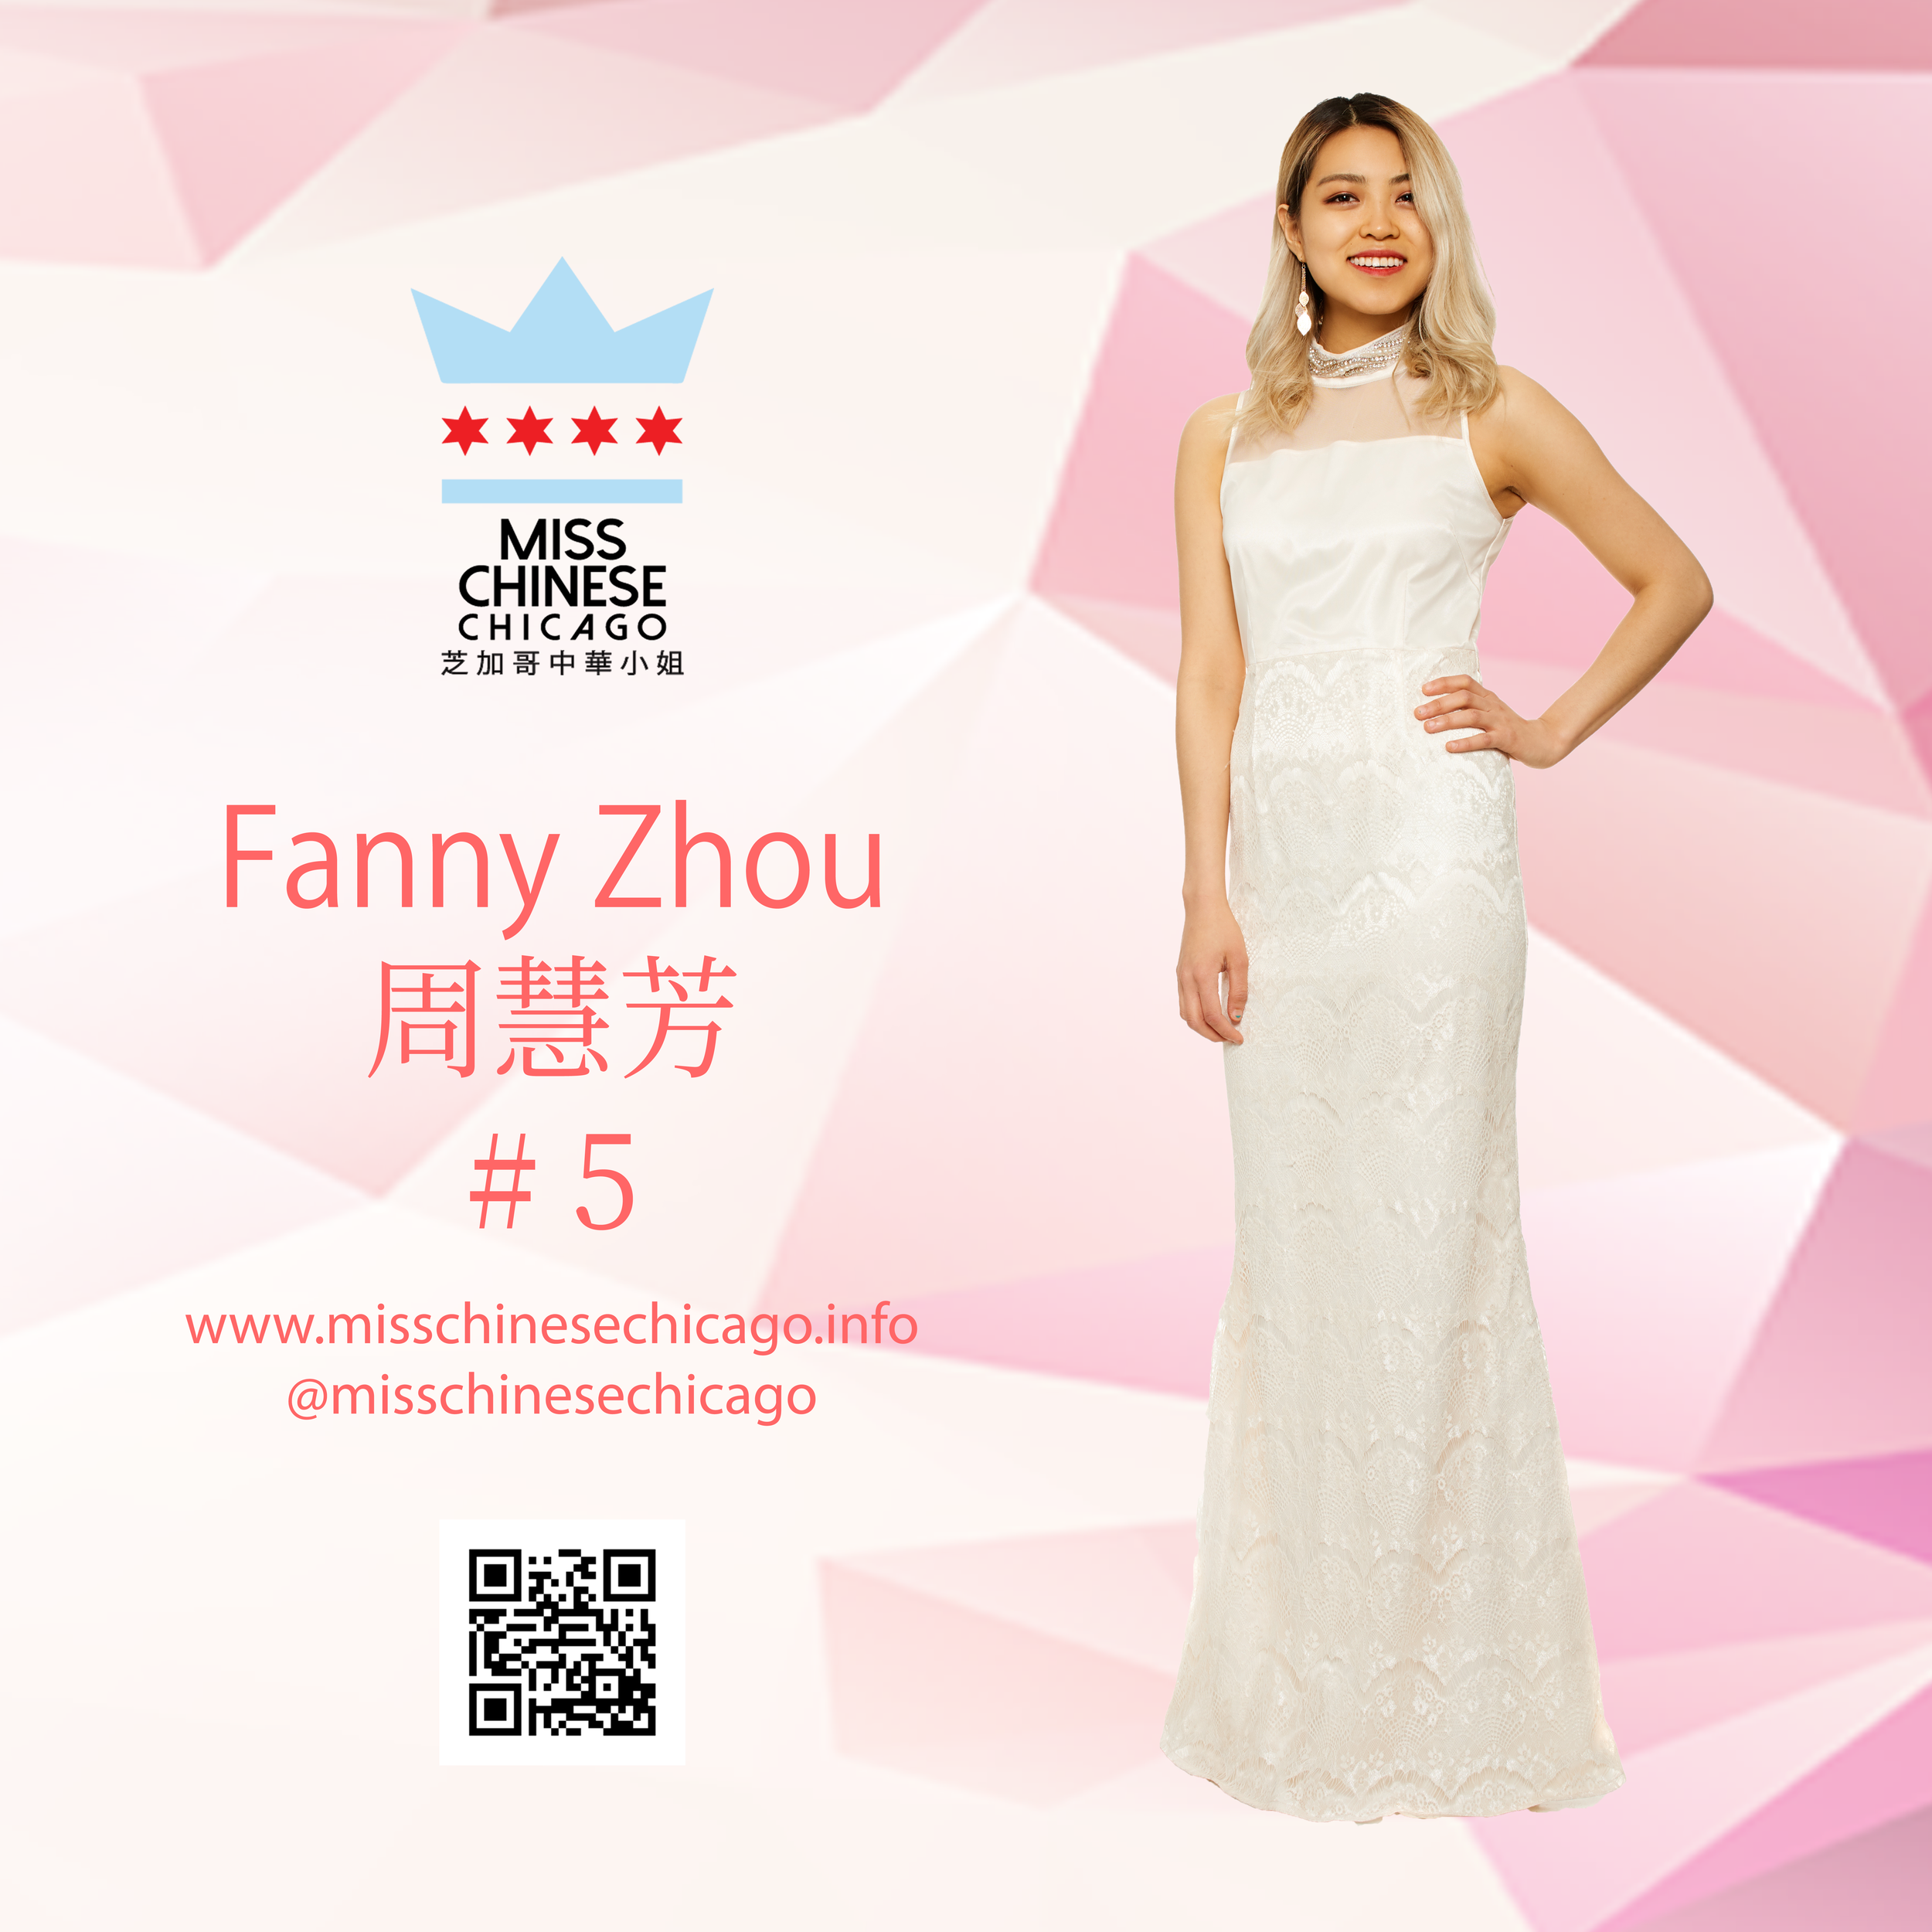 Fanny Zhou 2019 Contestant